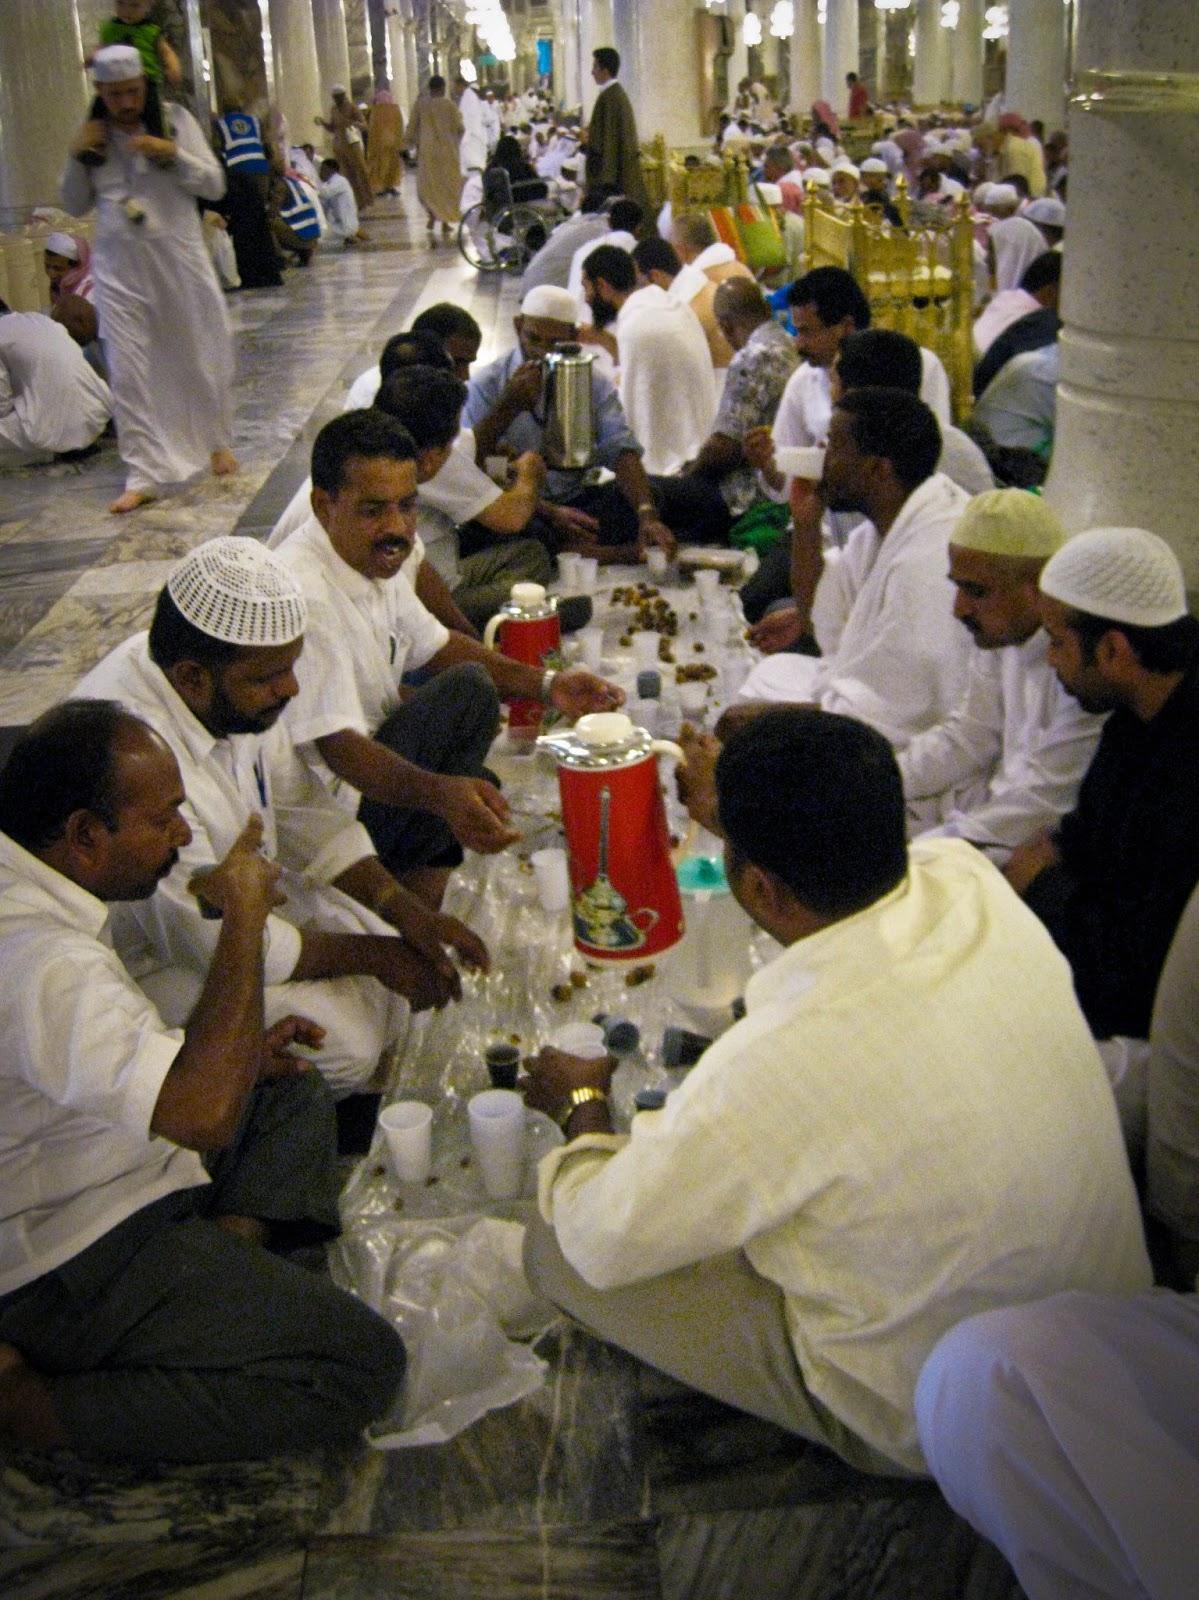 daftar umroh 2013, Paket Umroh Ramadhan 2013, umroh ramadhan, program umroh ramadhan, daftar umroh ramadhan 2013